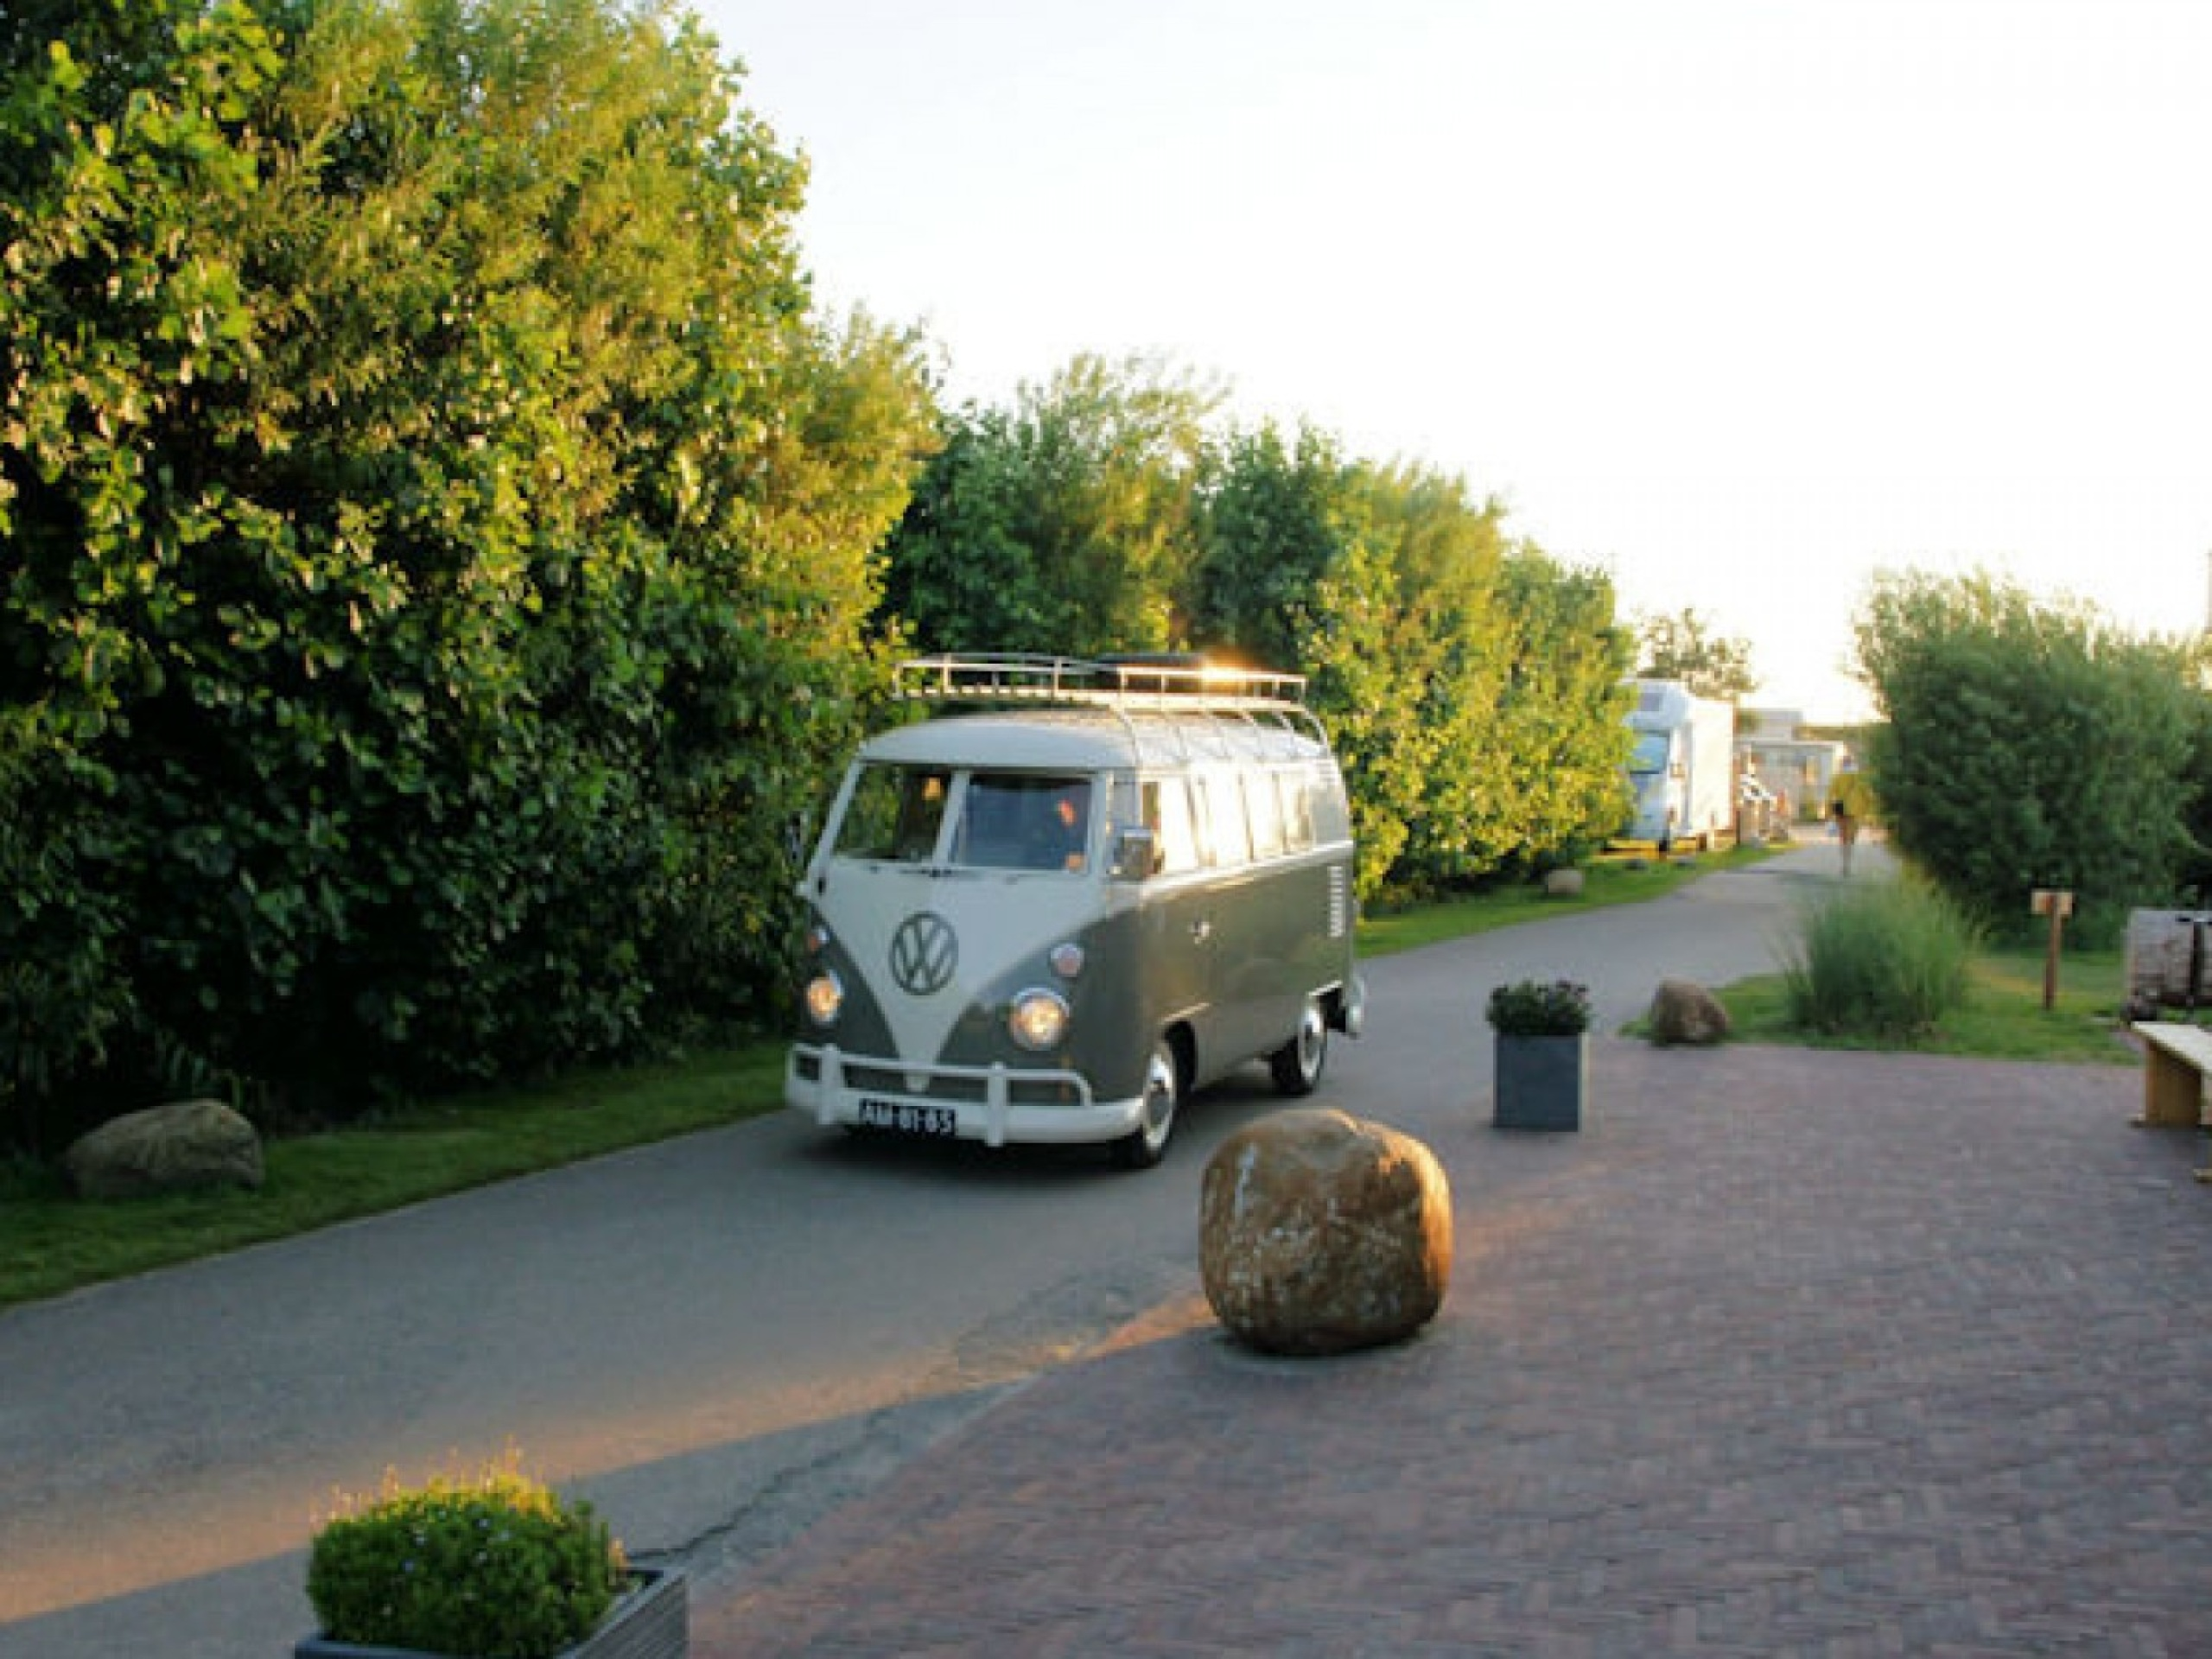 Schöner Camping in den Dünen am Leuchtturm und De Cocksdorp